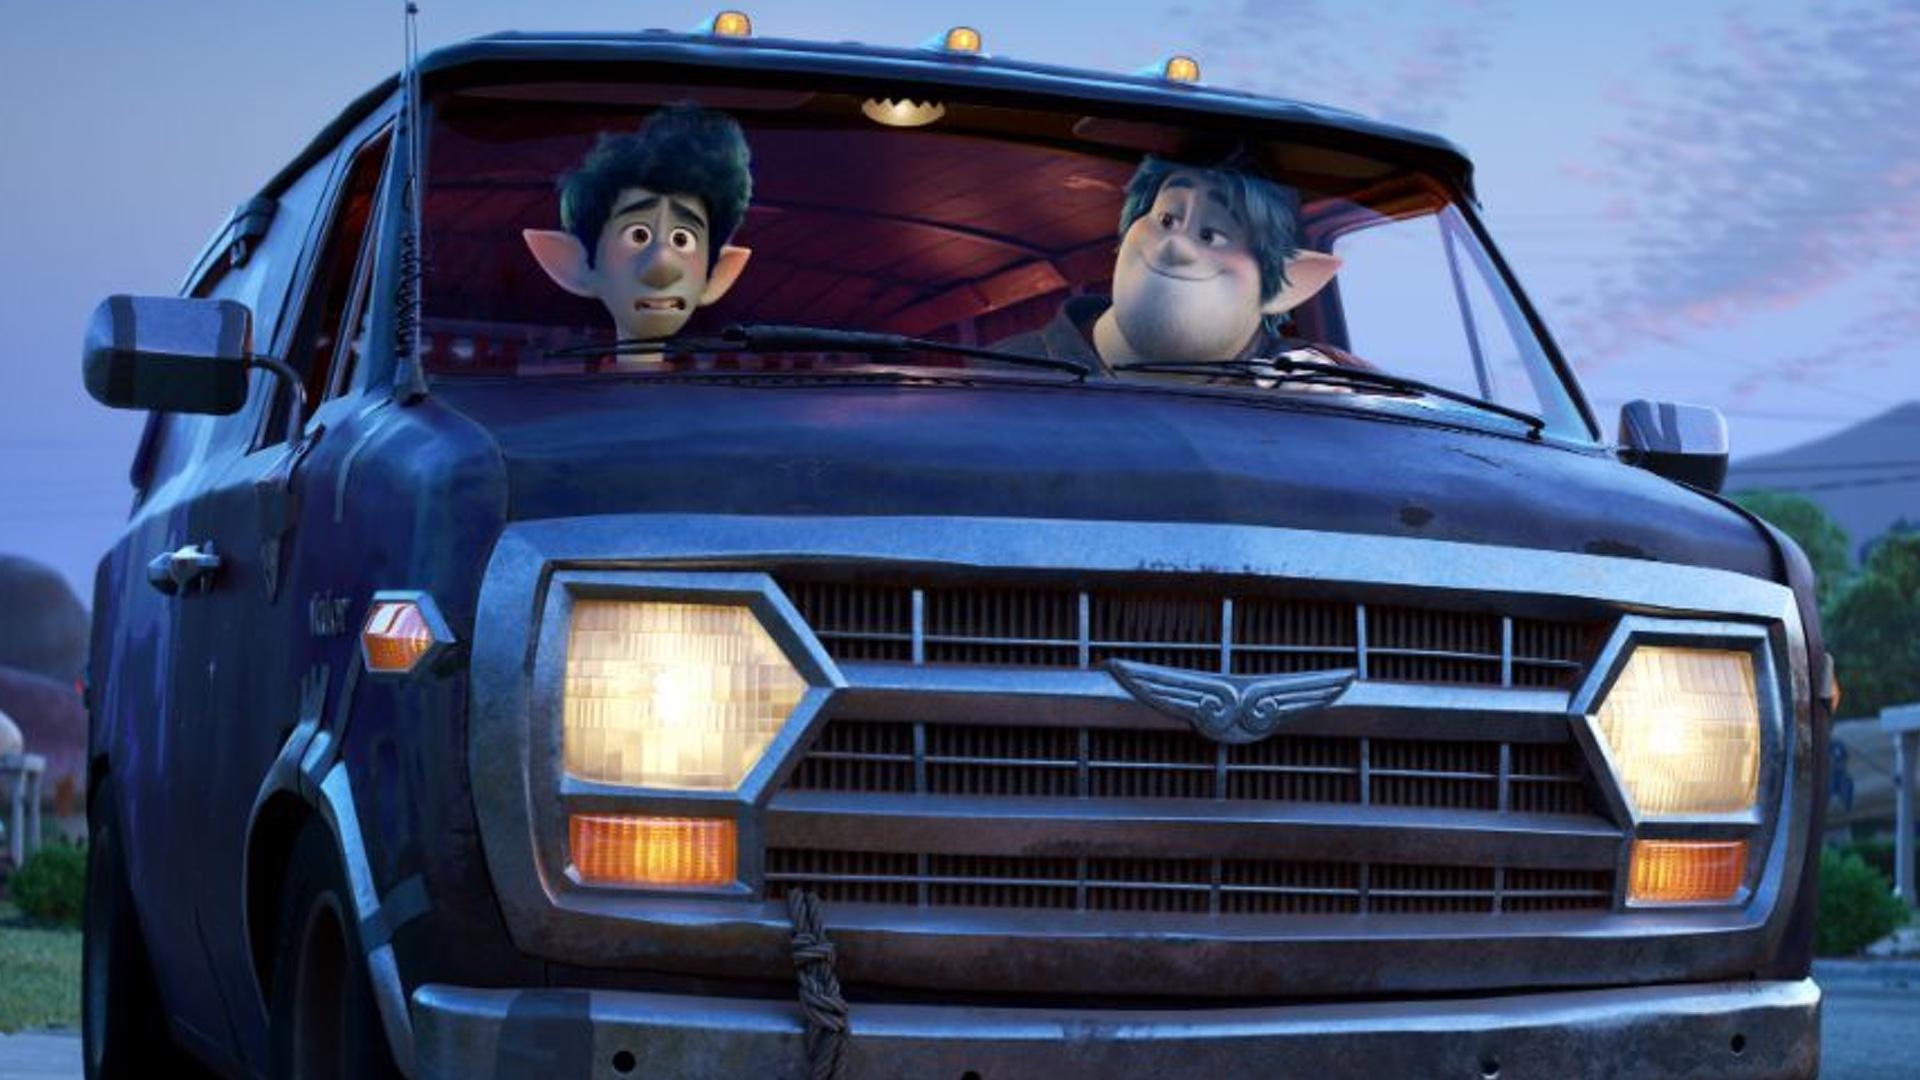 First Look at Chris Pratt and Tom Hollands Pixar Elf Film ONWARD 1920x1080